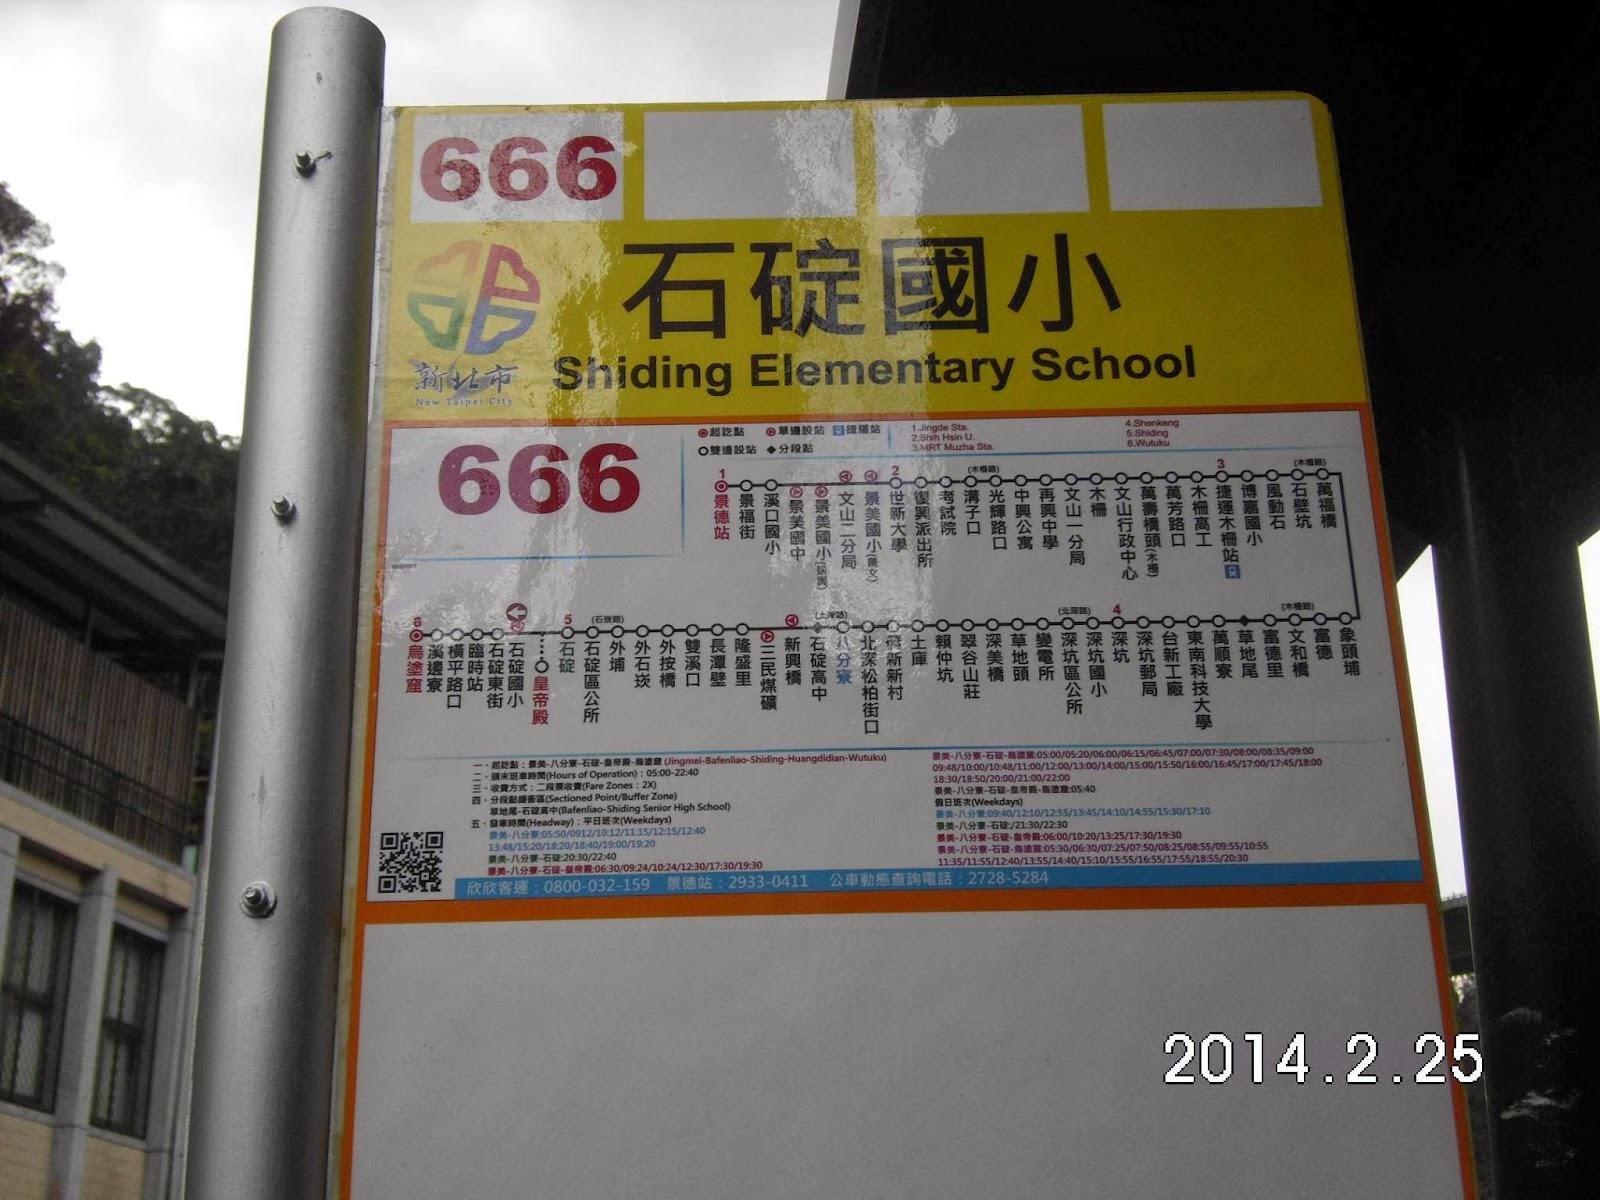 jm 明の部落格 (Blog): 2/25 淡蘭古道(石碇)+666公車接泊